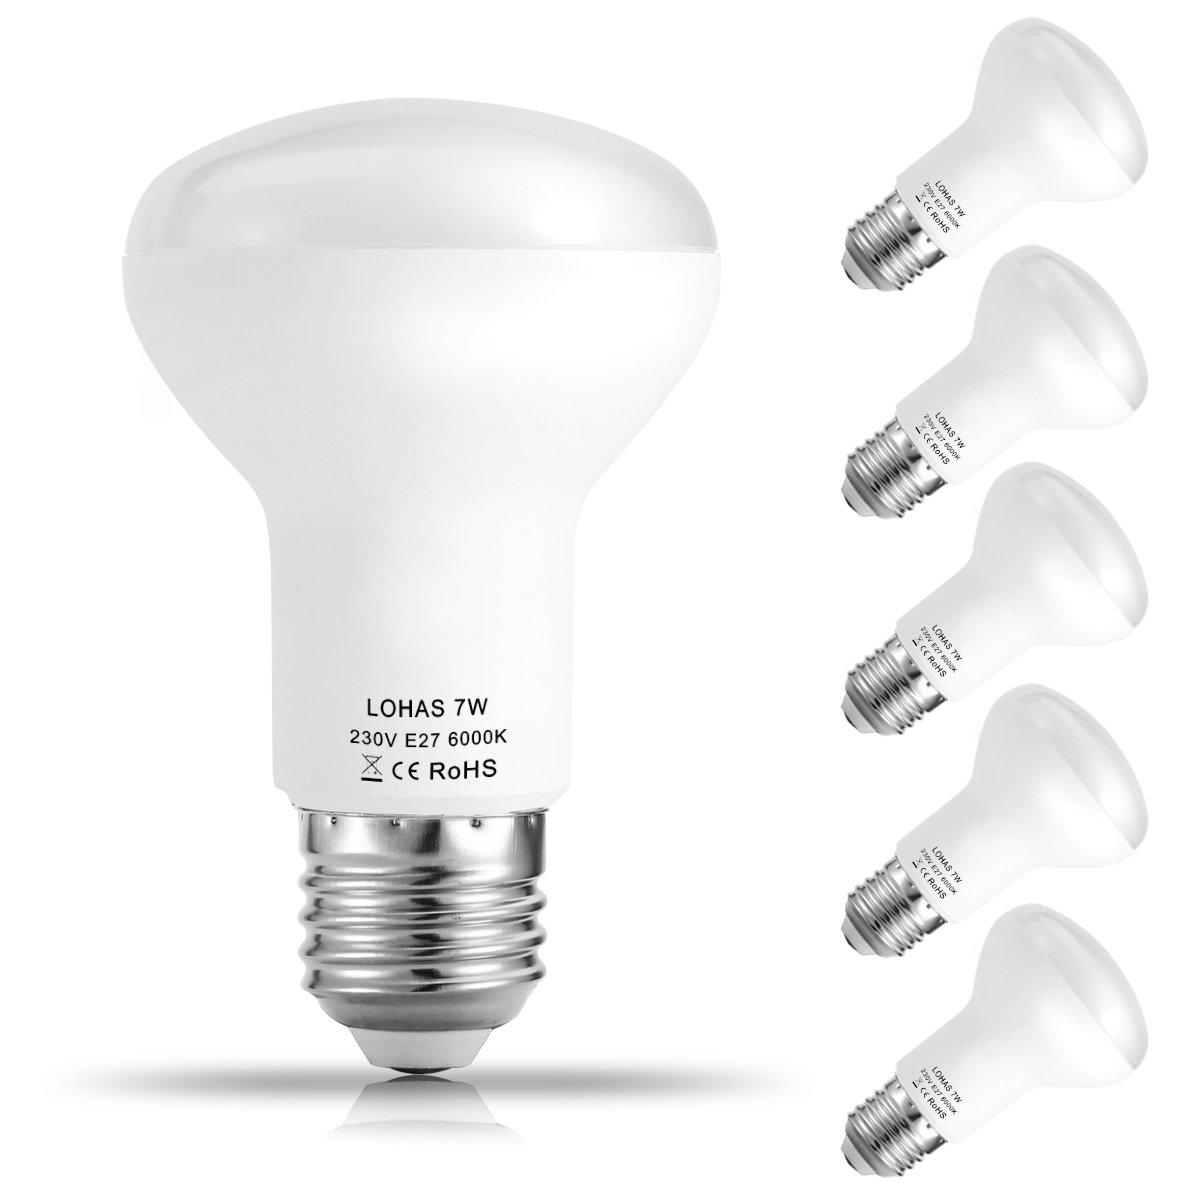 LOHAS® R63 7W E27 Reflectoras LED Bombillas, Equivalencia incandescente 60W, Bombillas LED, 560lm, 6000k Blanco frío, Luz amplia 120°, 220-240 V AC, ...